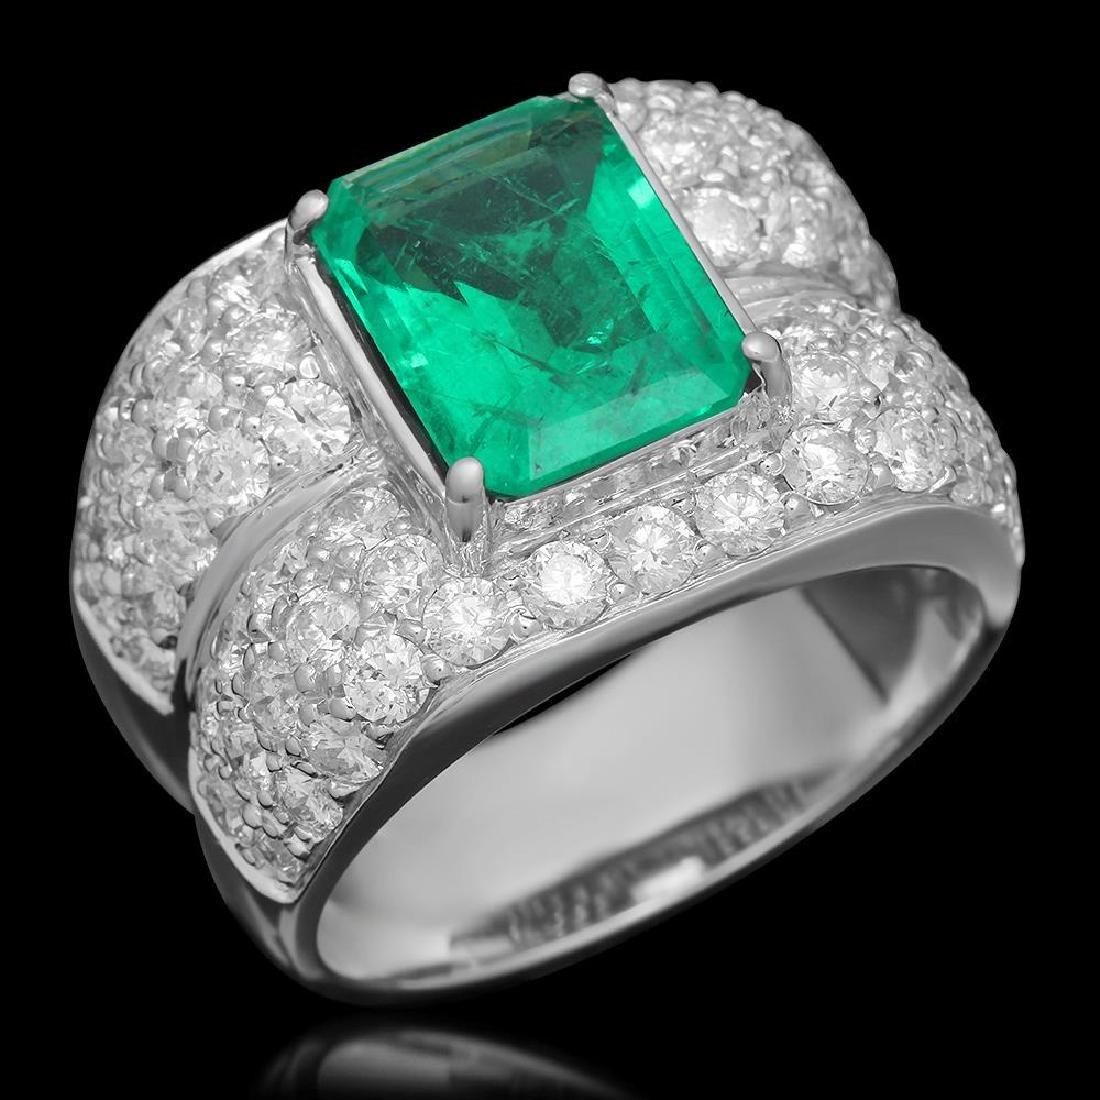 14K Gold 3.45 Emerald 3.68 Diamond Ring